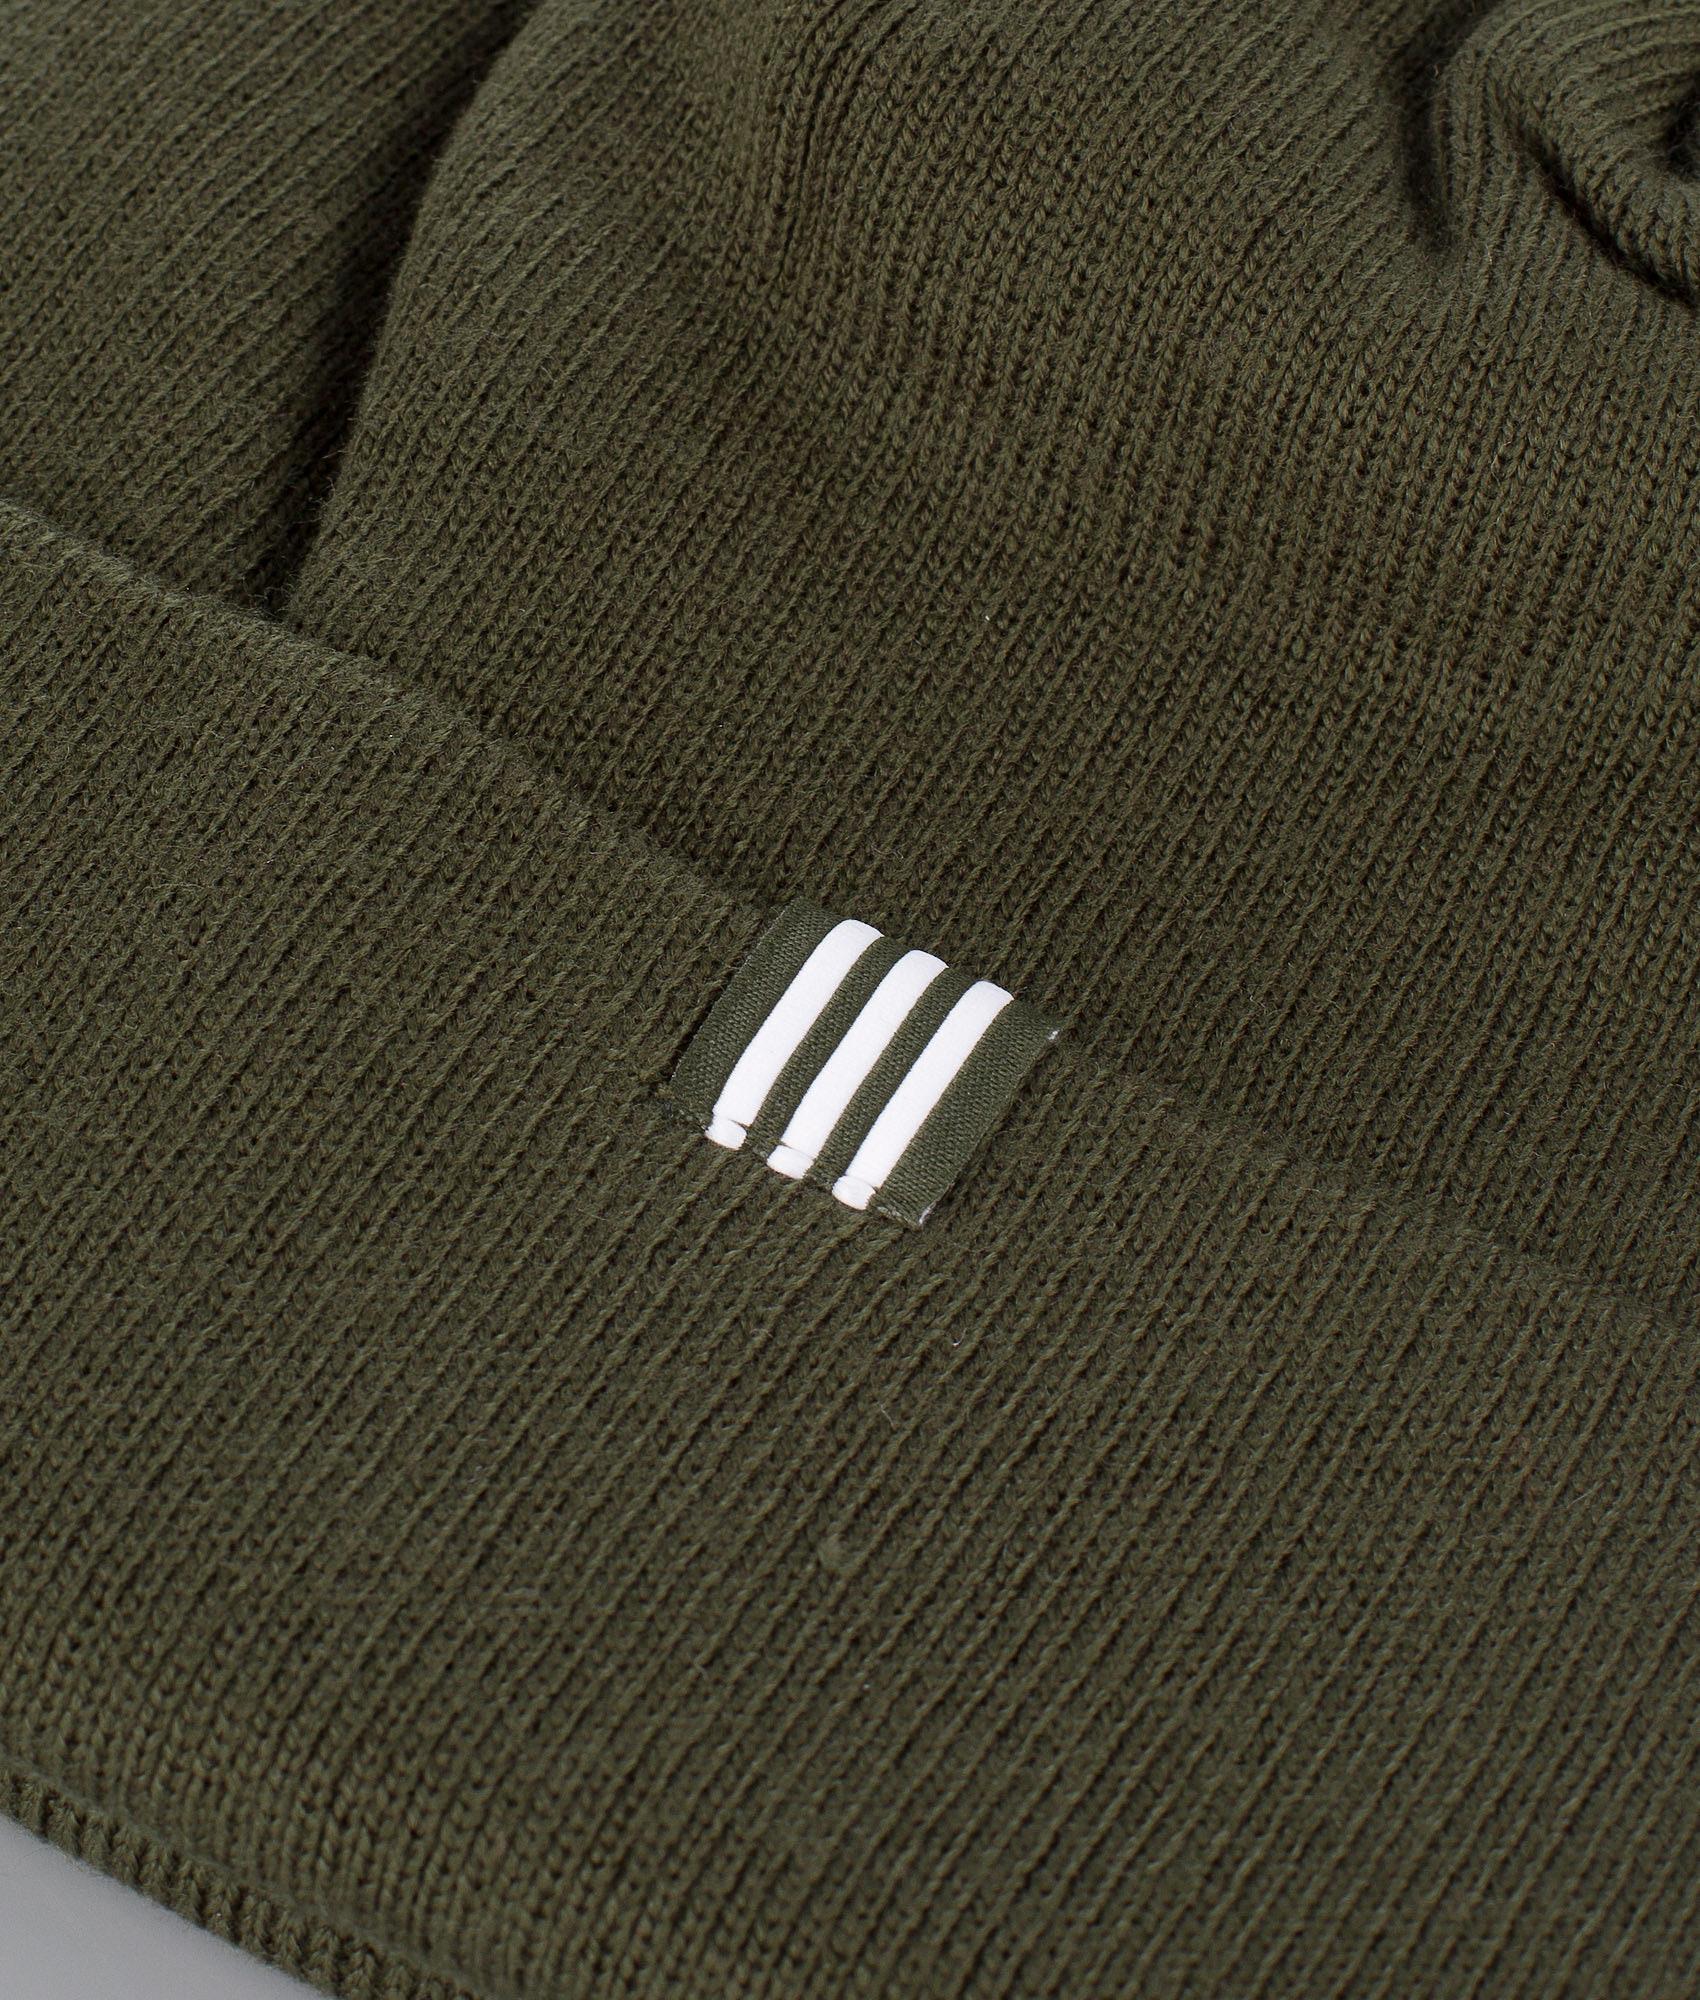 Adidas Originals Trefoil Mütze Night Cargo - Ridestore.de 66a3fa34c117